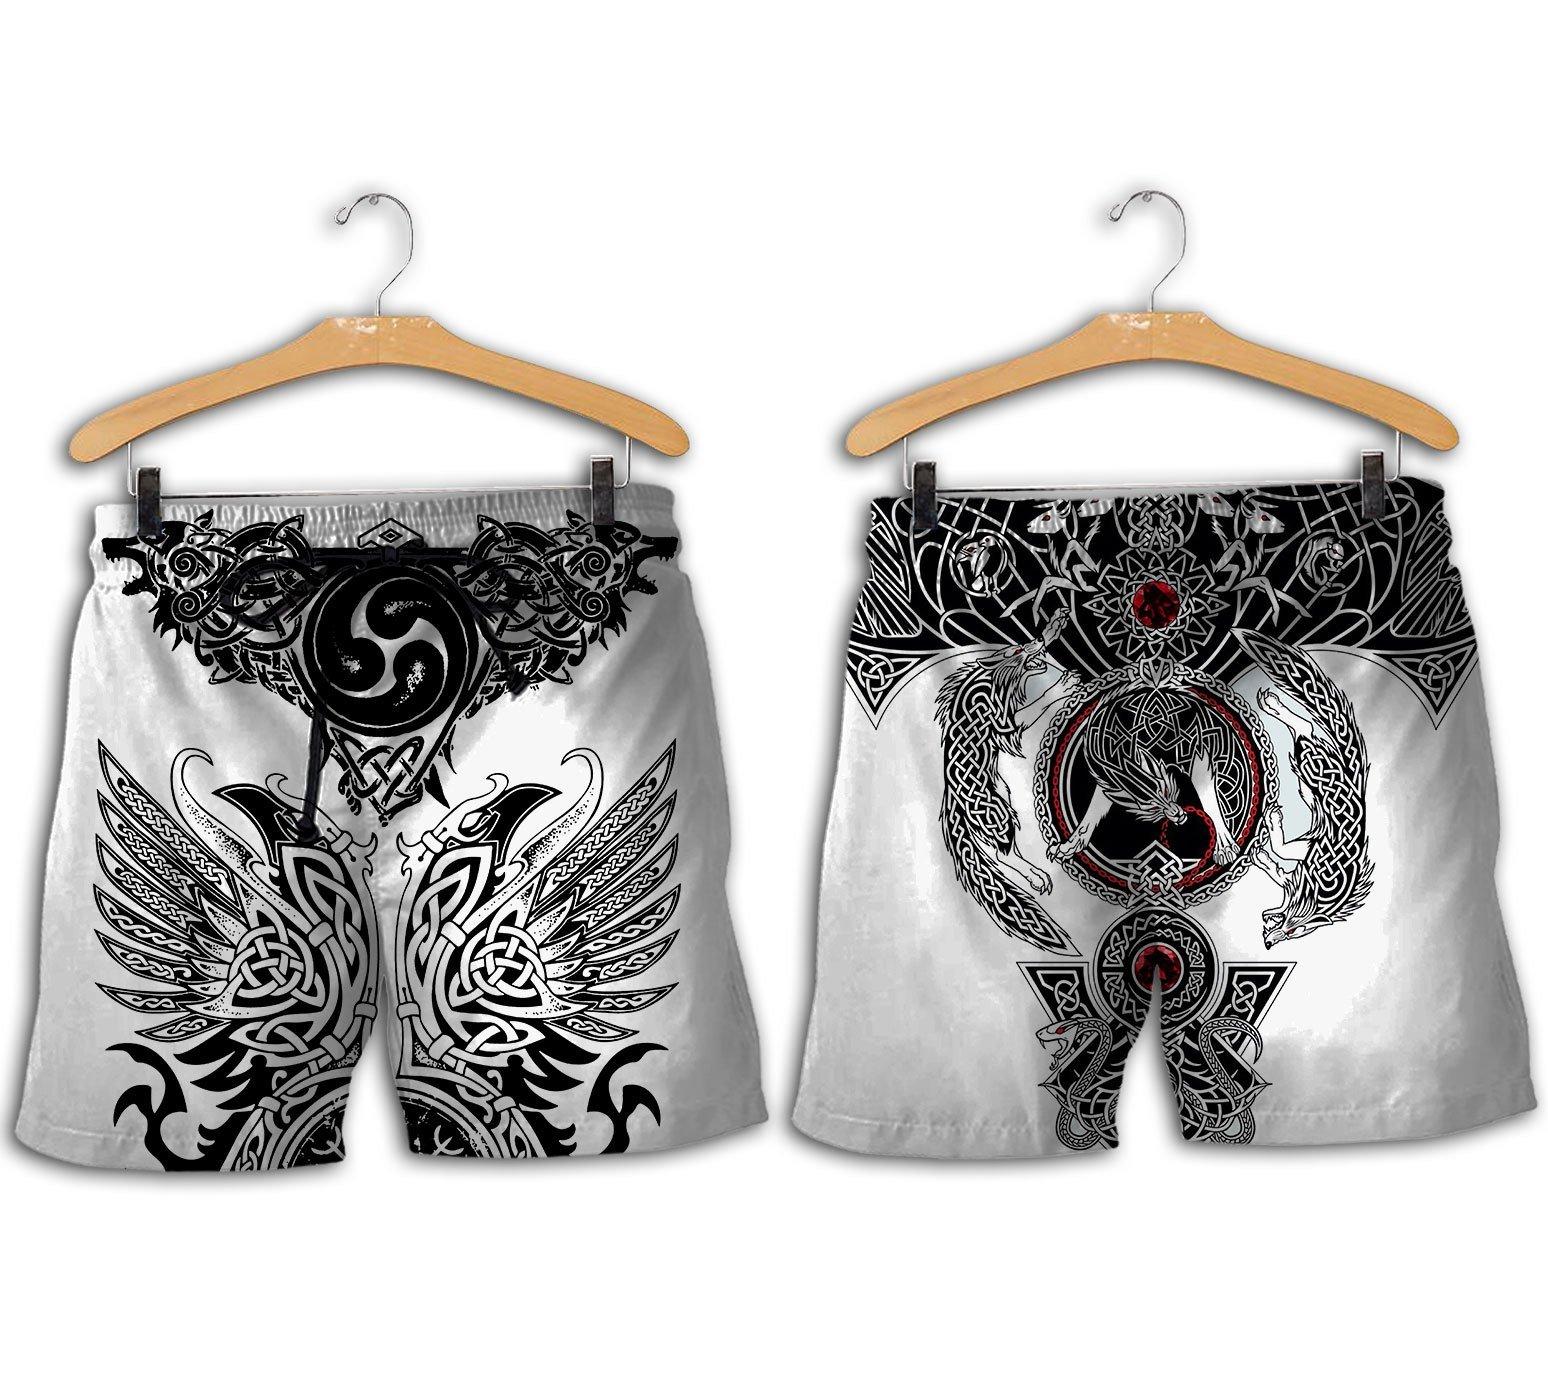 The viking tattoo art 3d full printing shorts